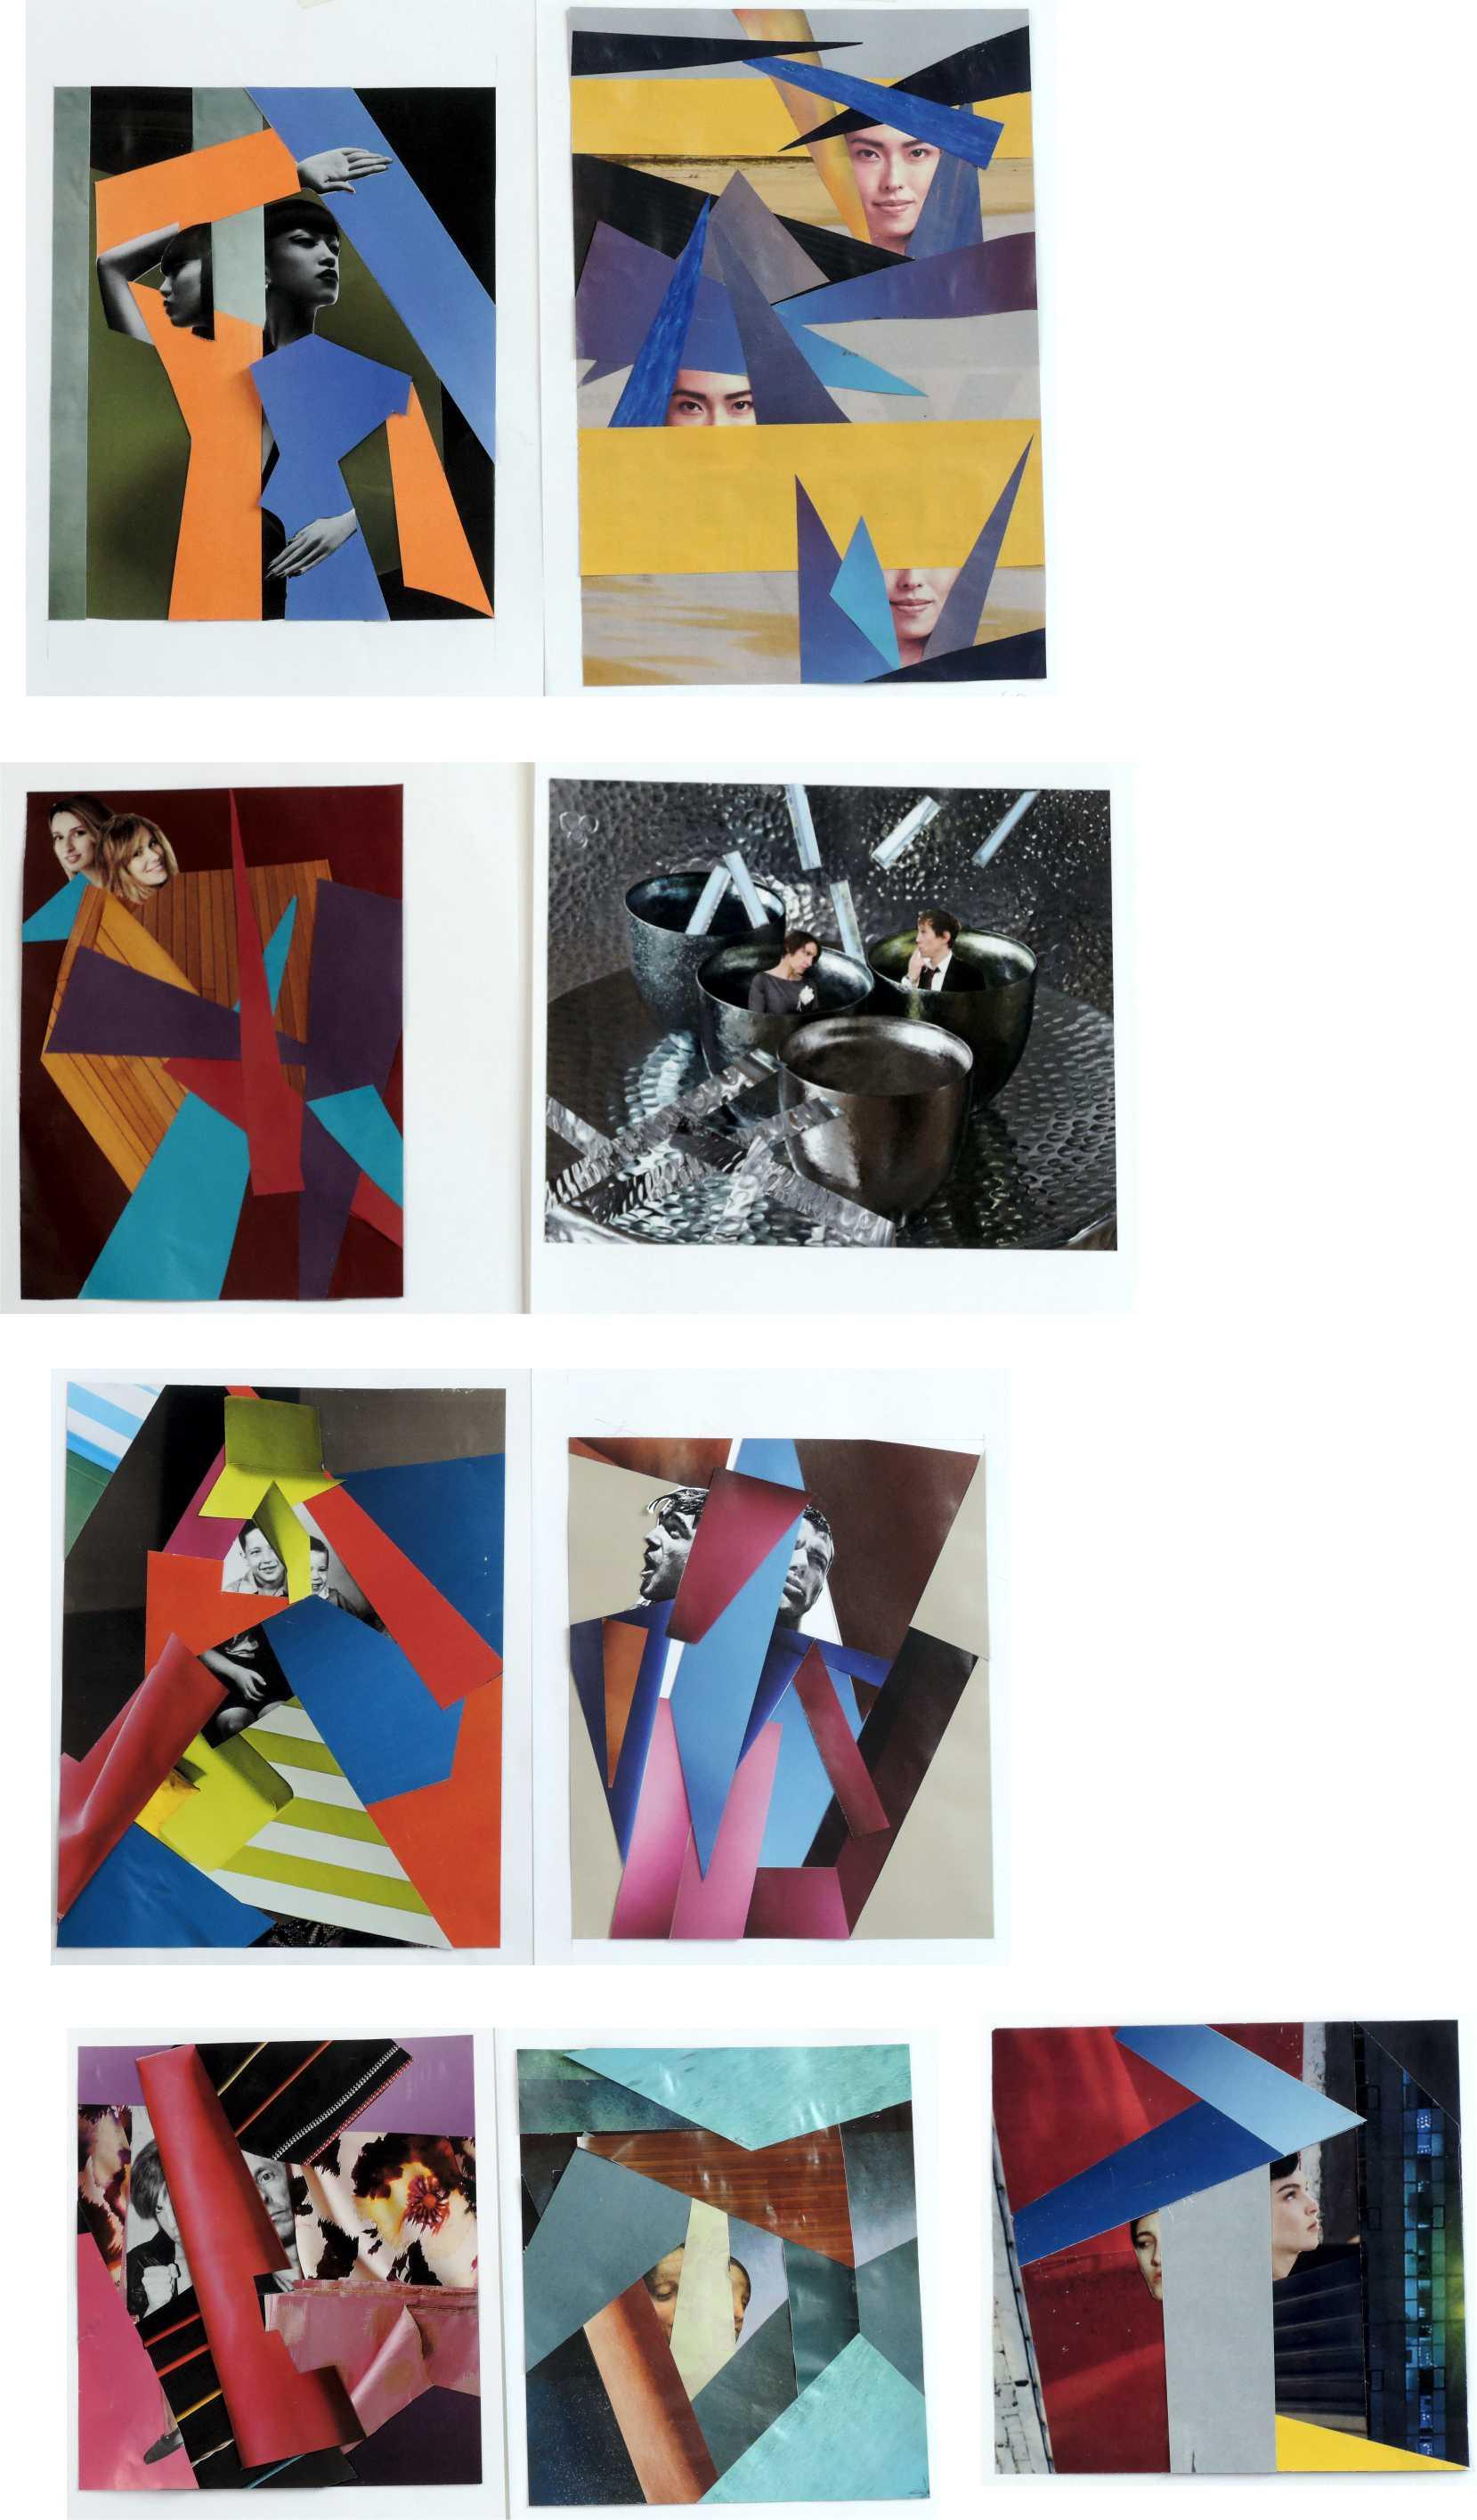 Collages Strook jeudi 16 novembre 2017 (2)